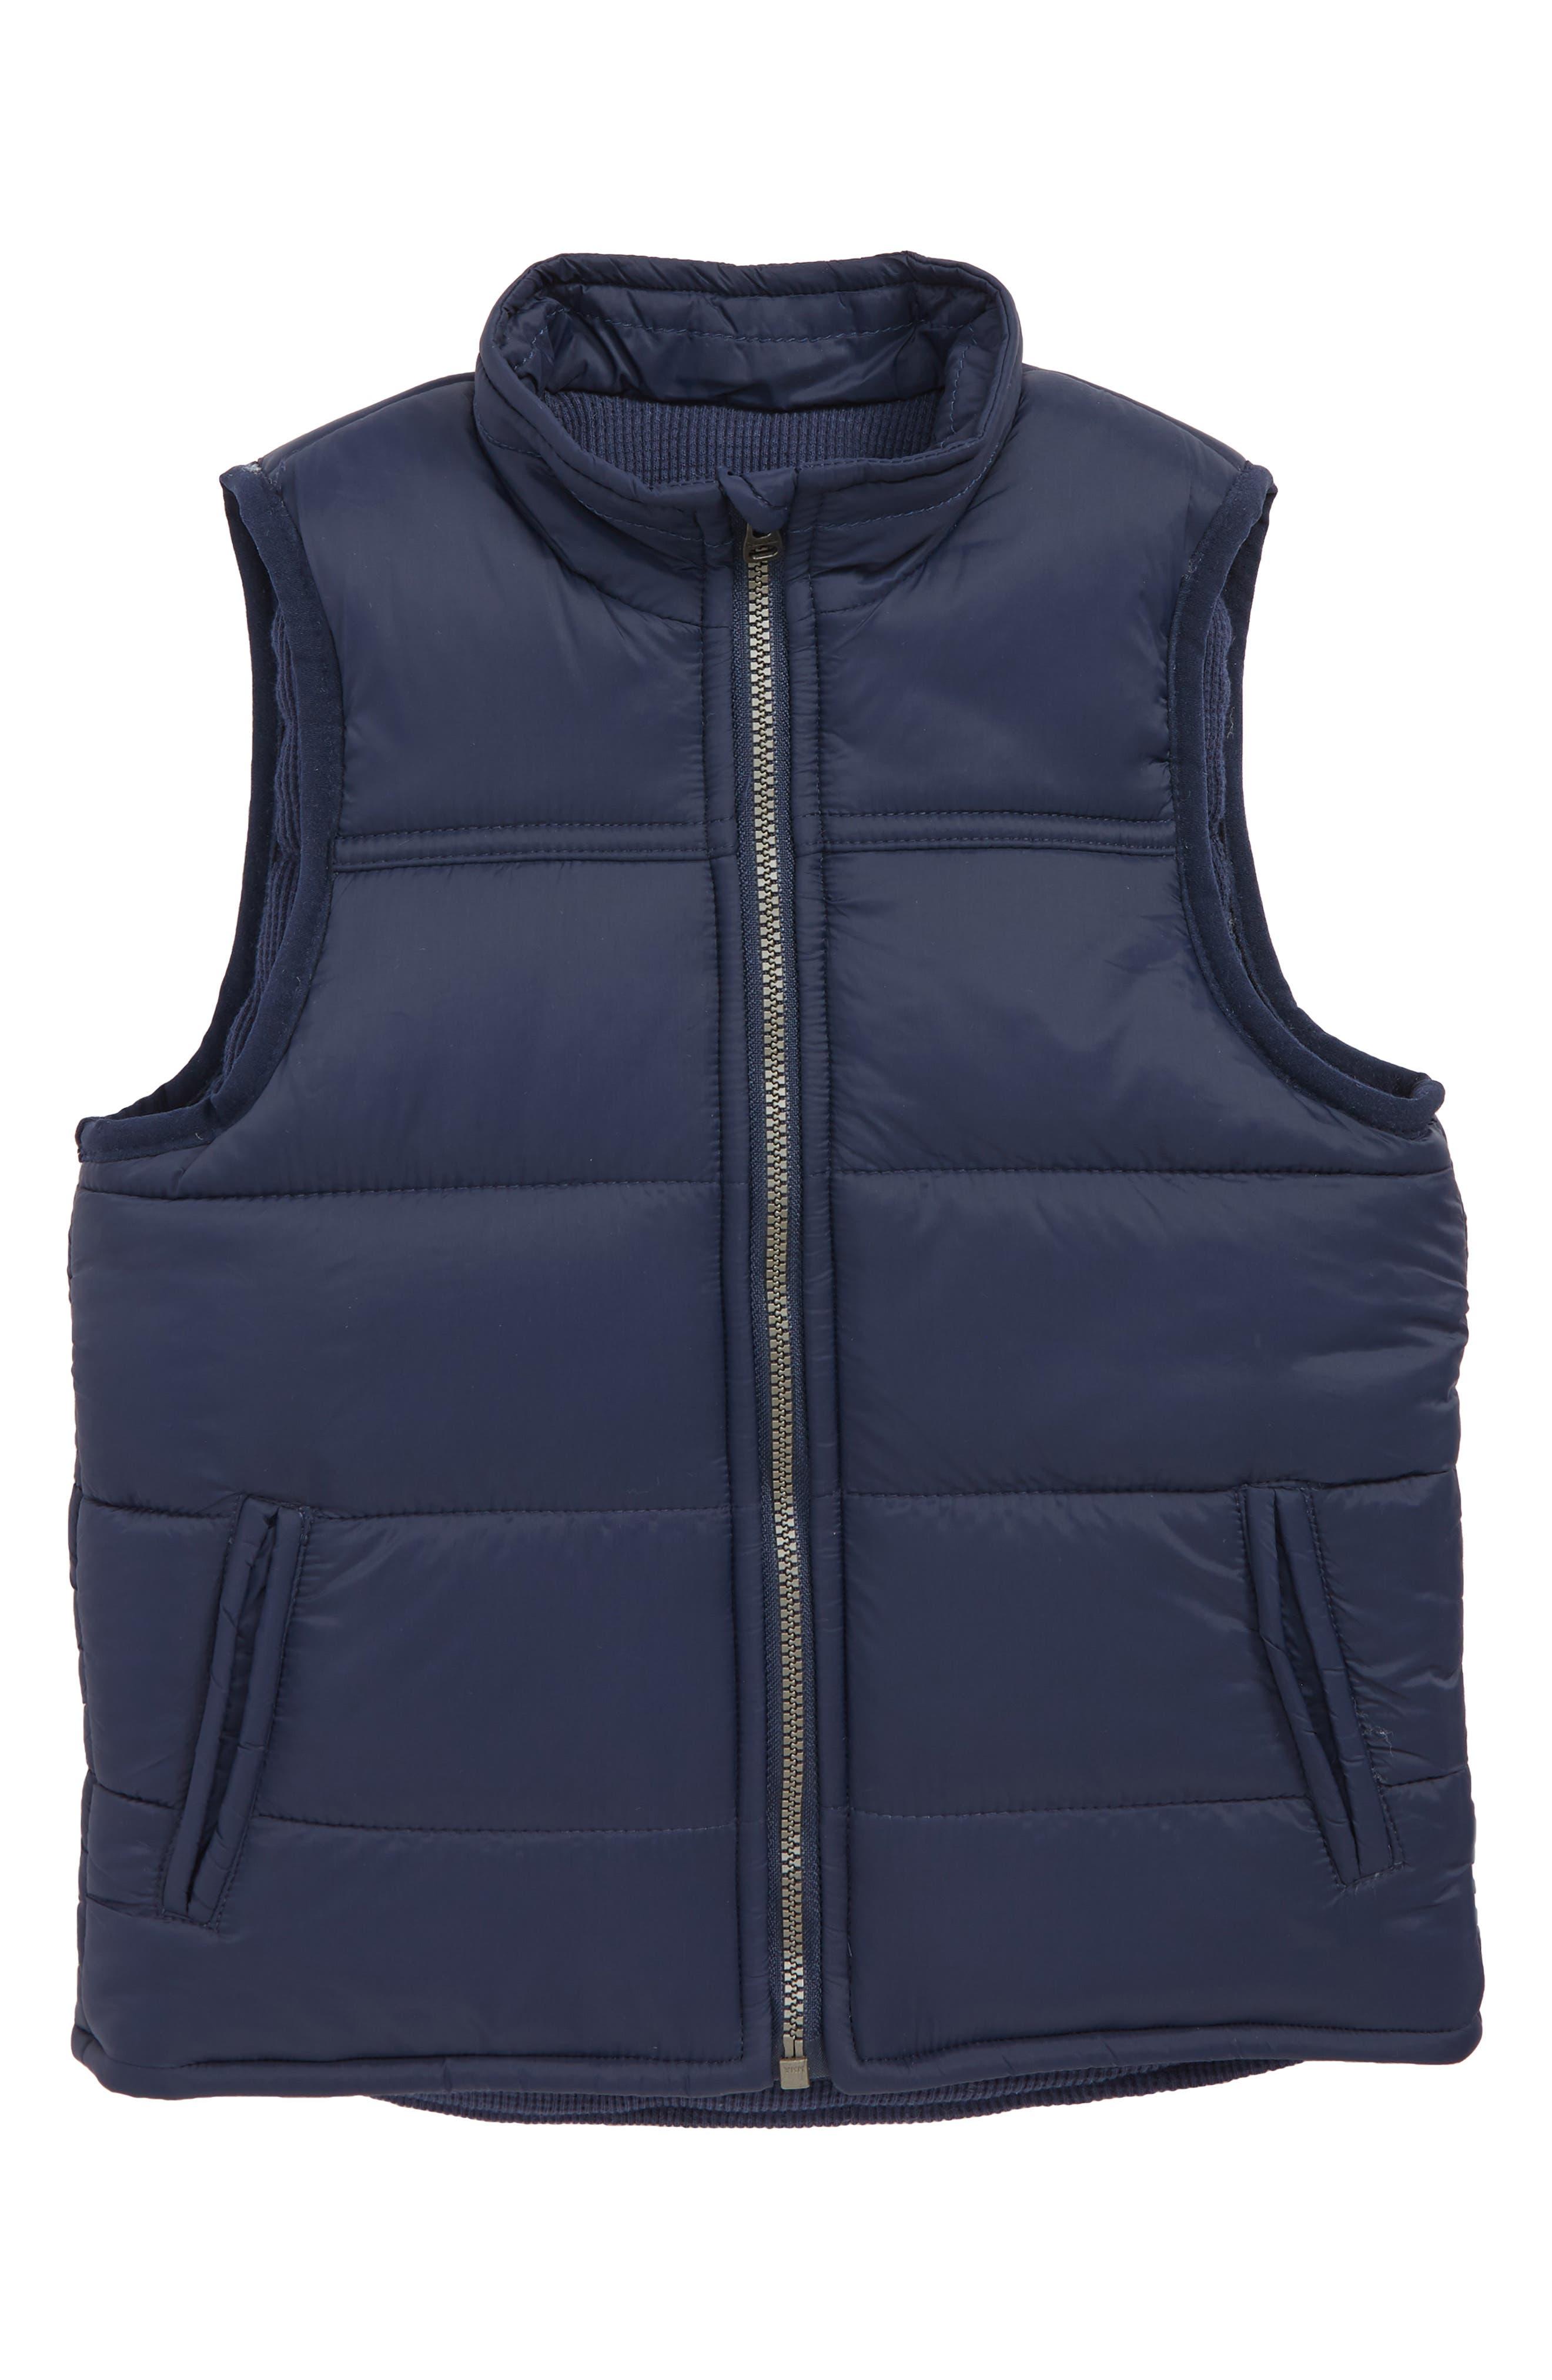 Puffer Vest,                         Main,                         color, 411